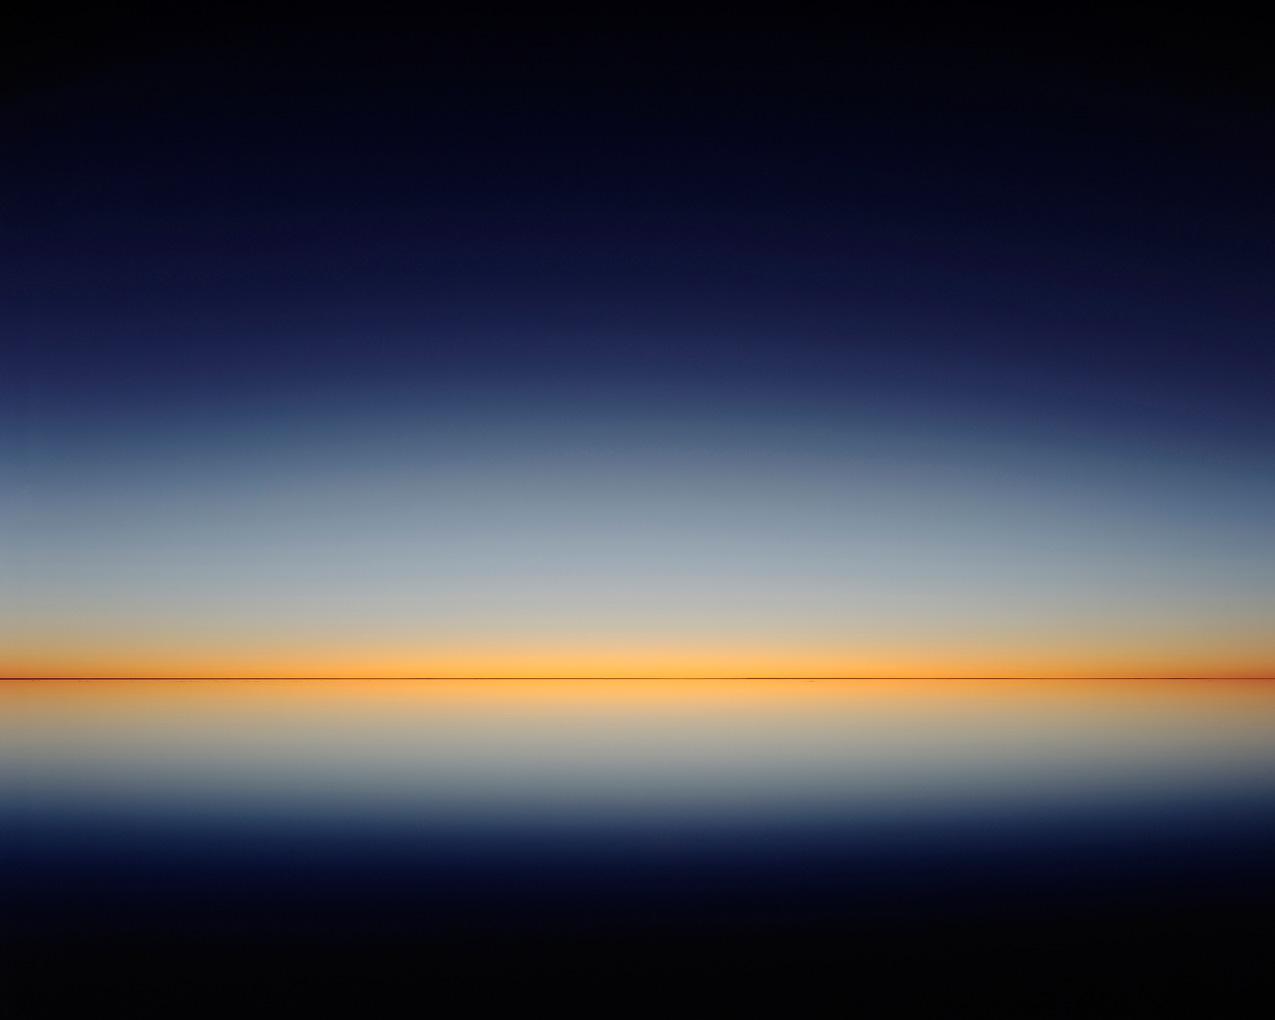 Salt 101, 120cm x 150cm, digital pigment print on cotton rag, edition of 7, 2006